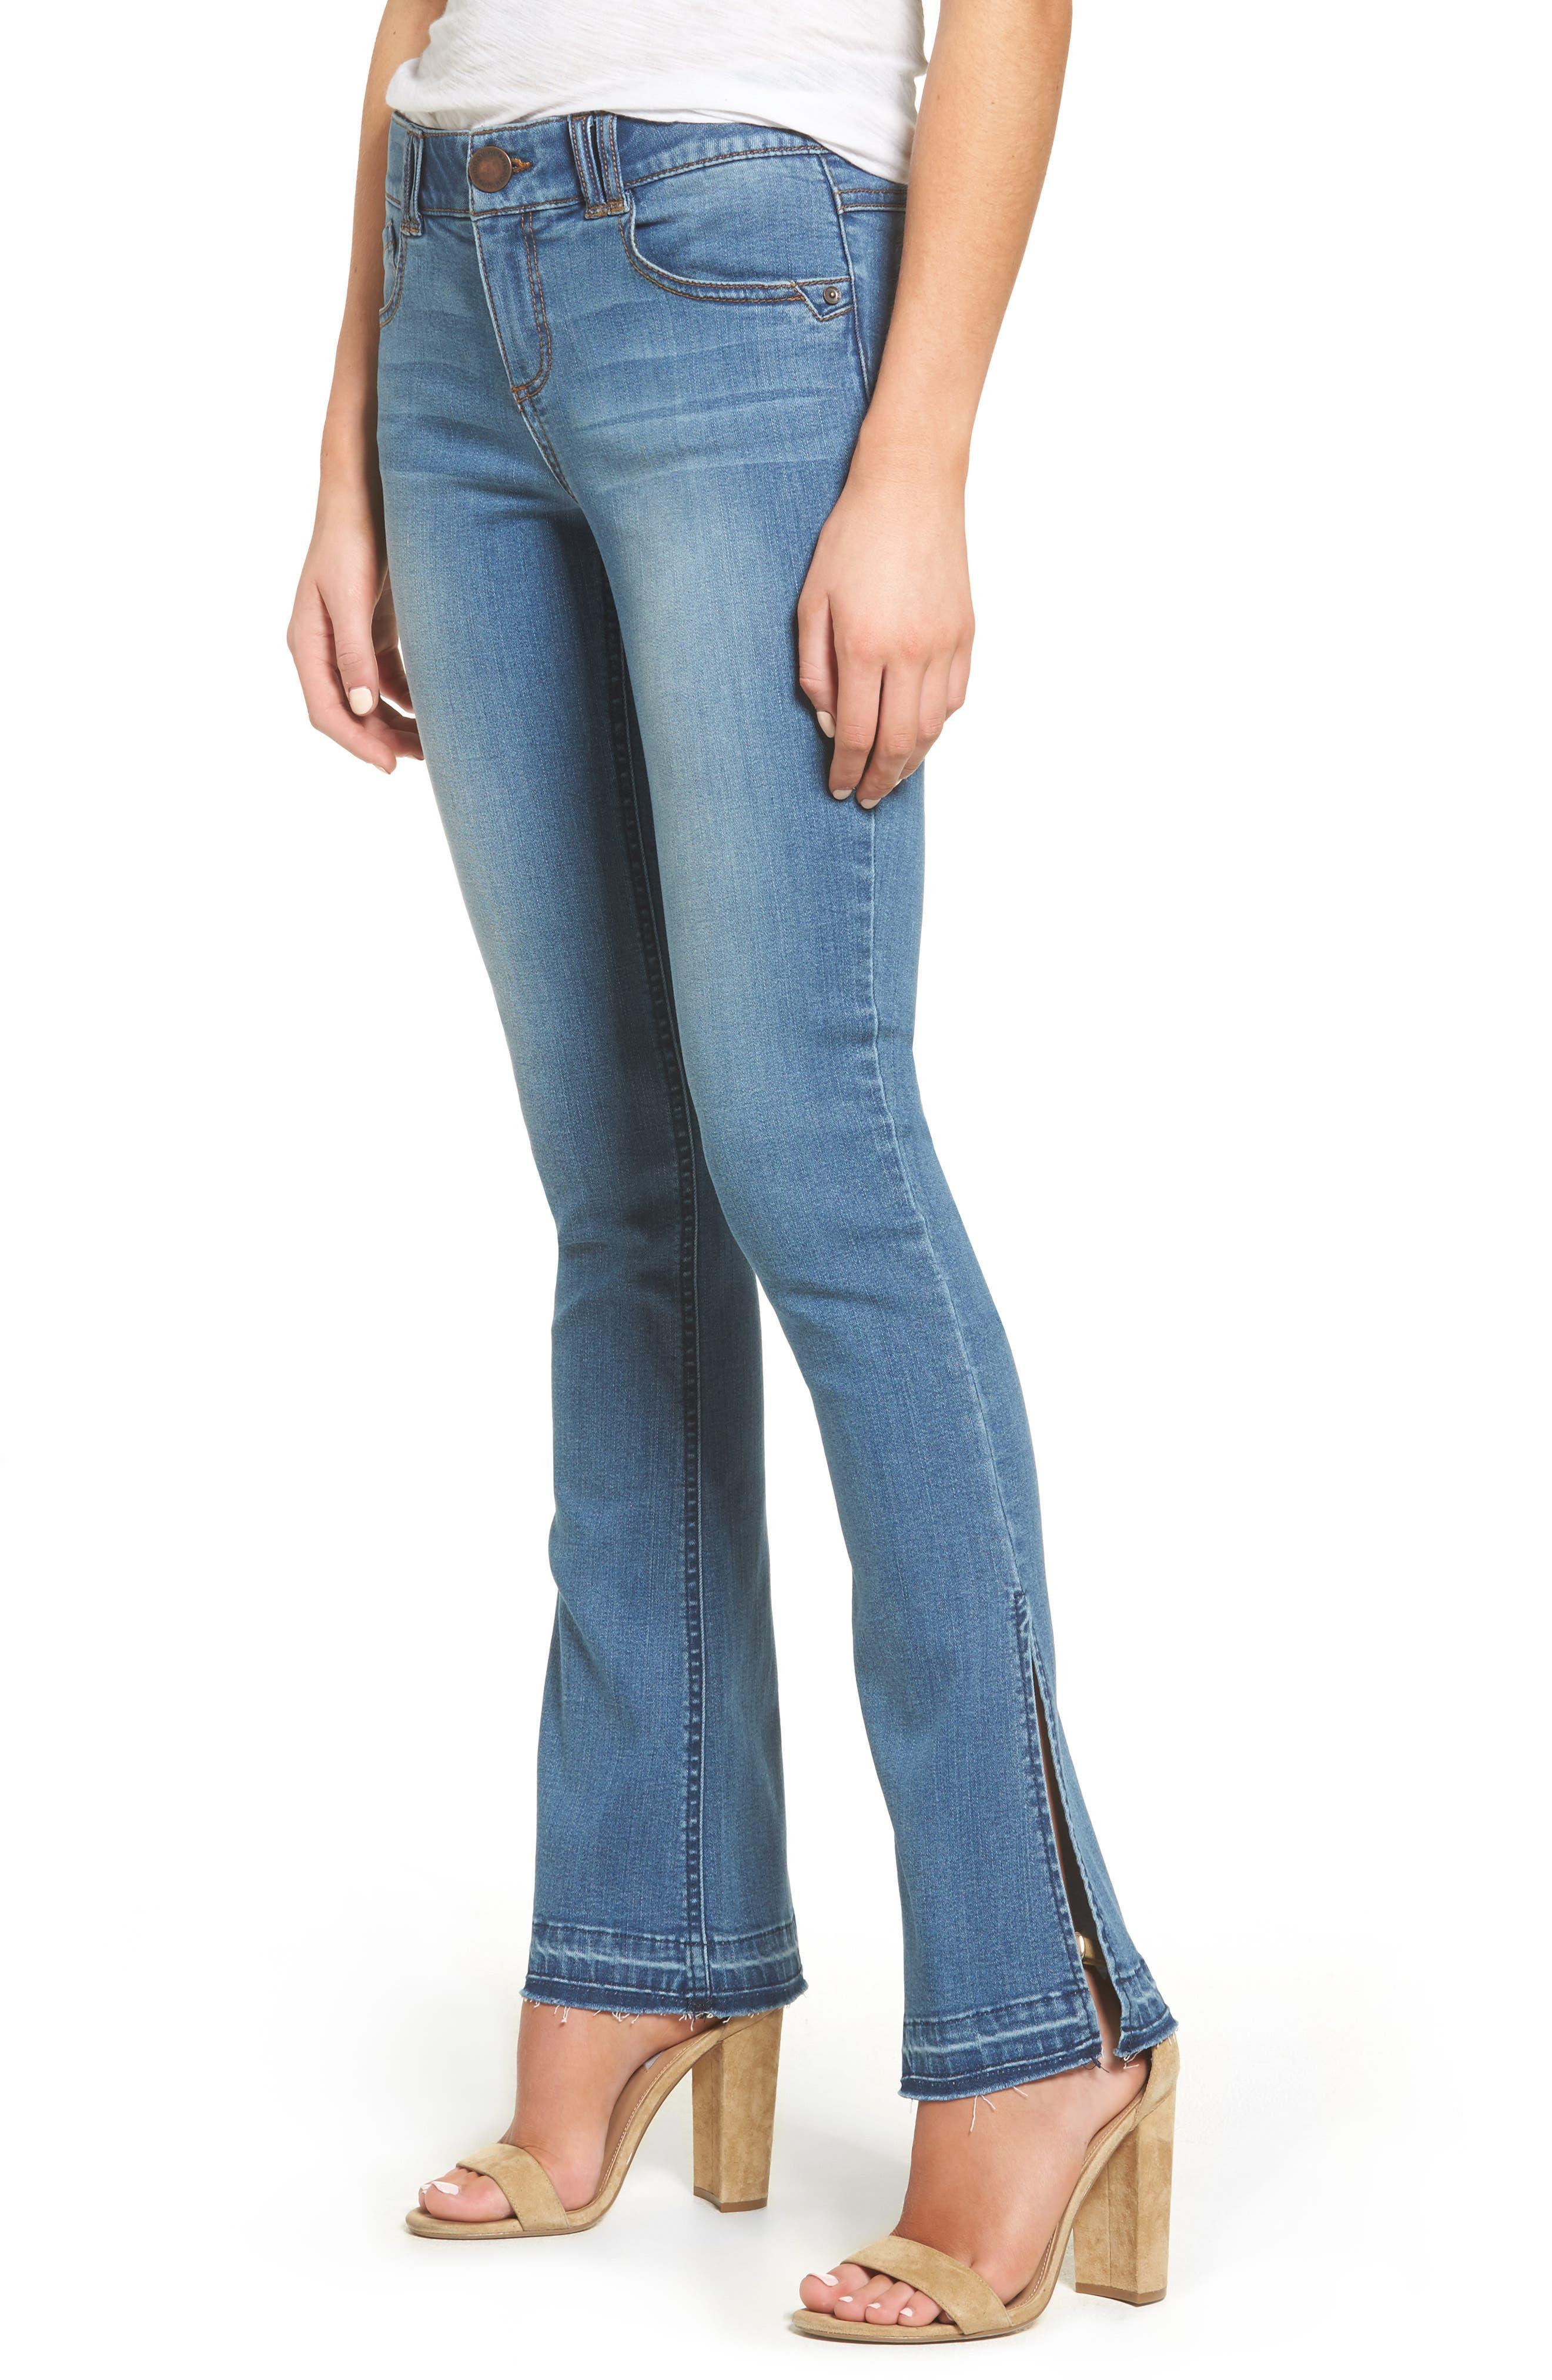 Main Image - Wit & Wisdom Ab-solution Split Release Hem Jeans (Regular & Petite) (Nordstrom Exclusive)